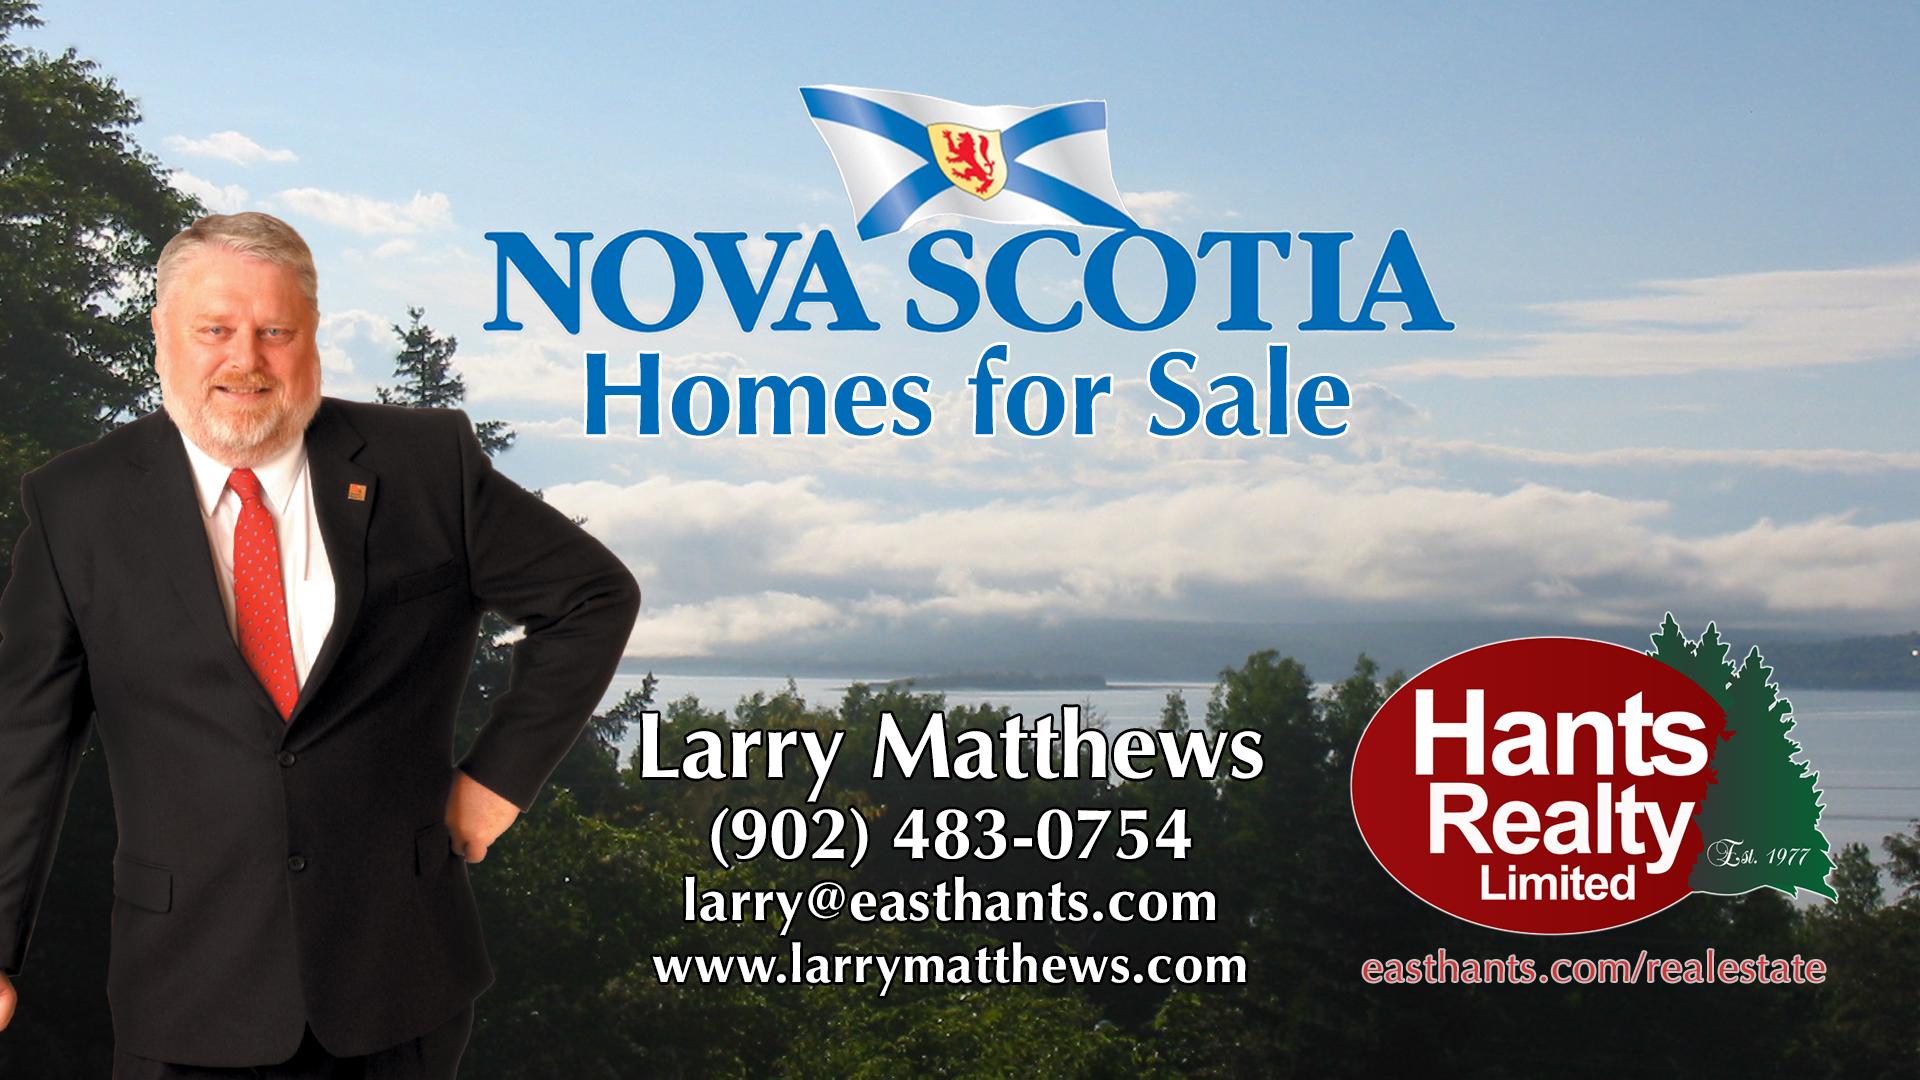 Nova Scotia Property Appraiser